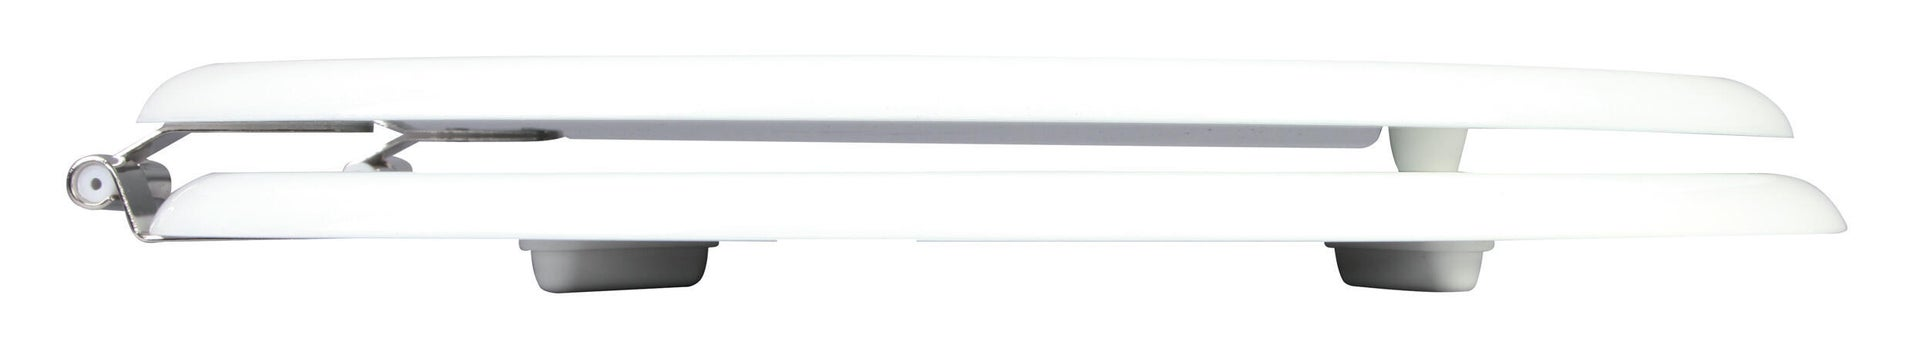 Copriwater ovale Universale Woody WIRQUIN legno massello bianco - 3